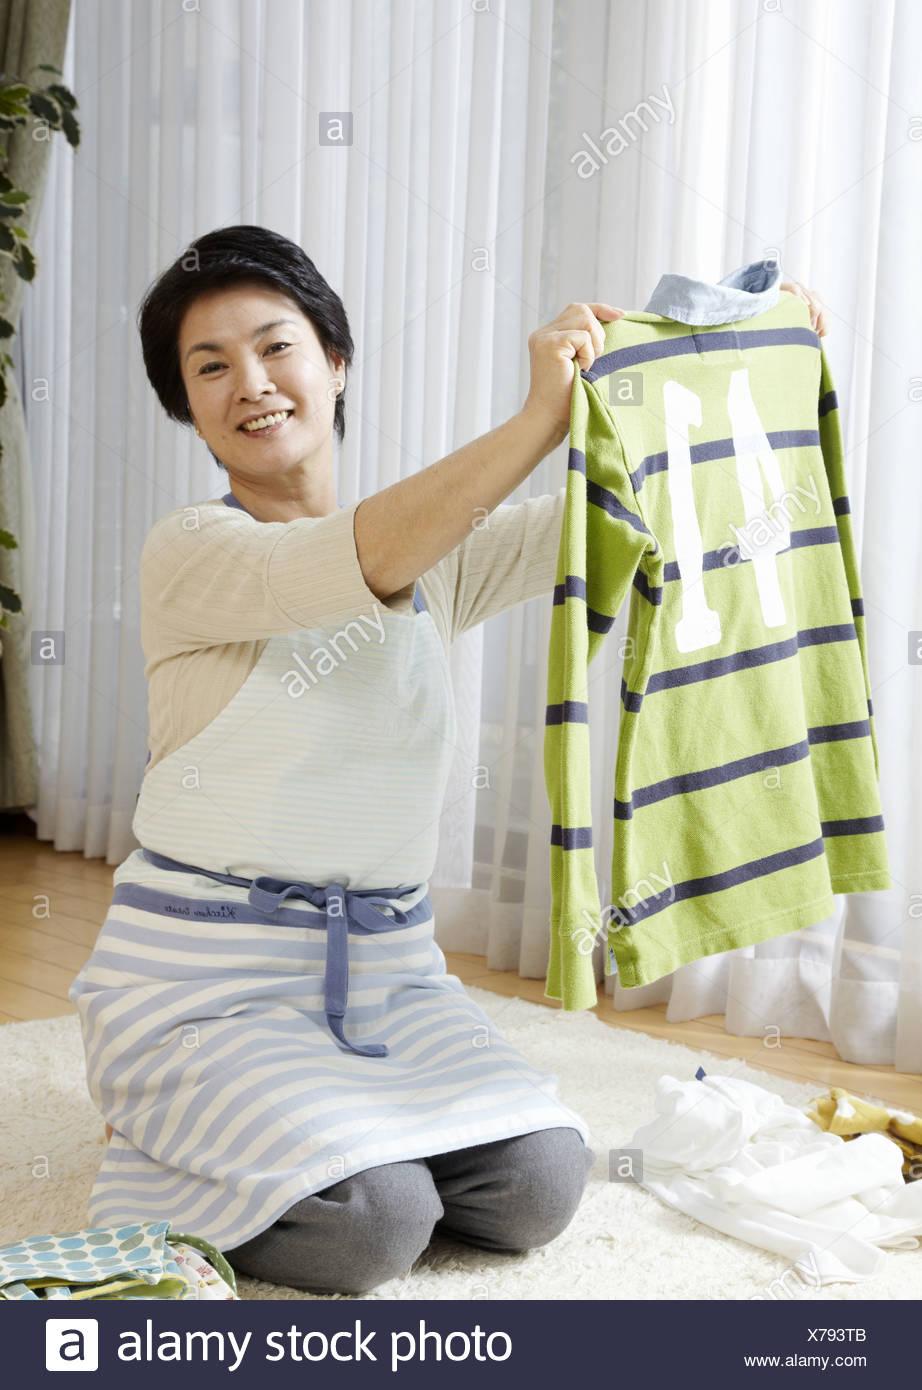 Woman folding laundry - Stock Image